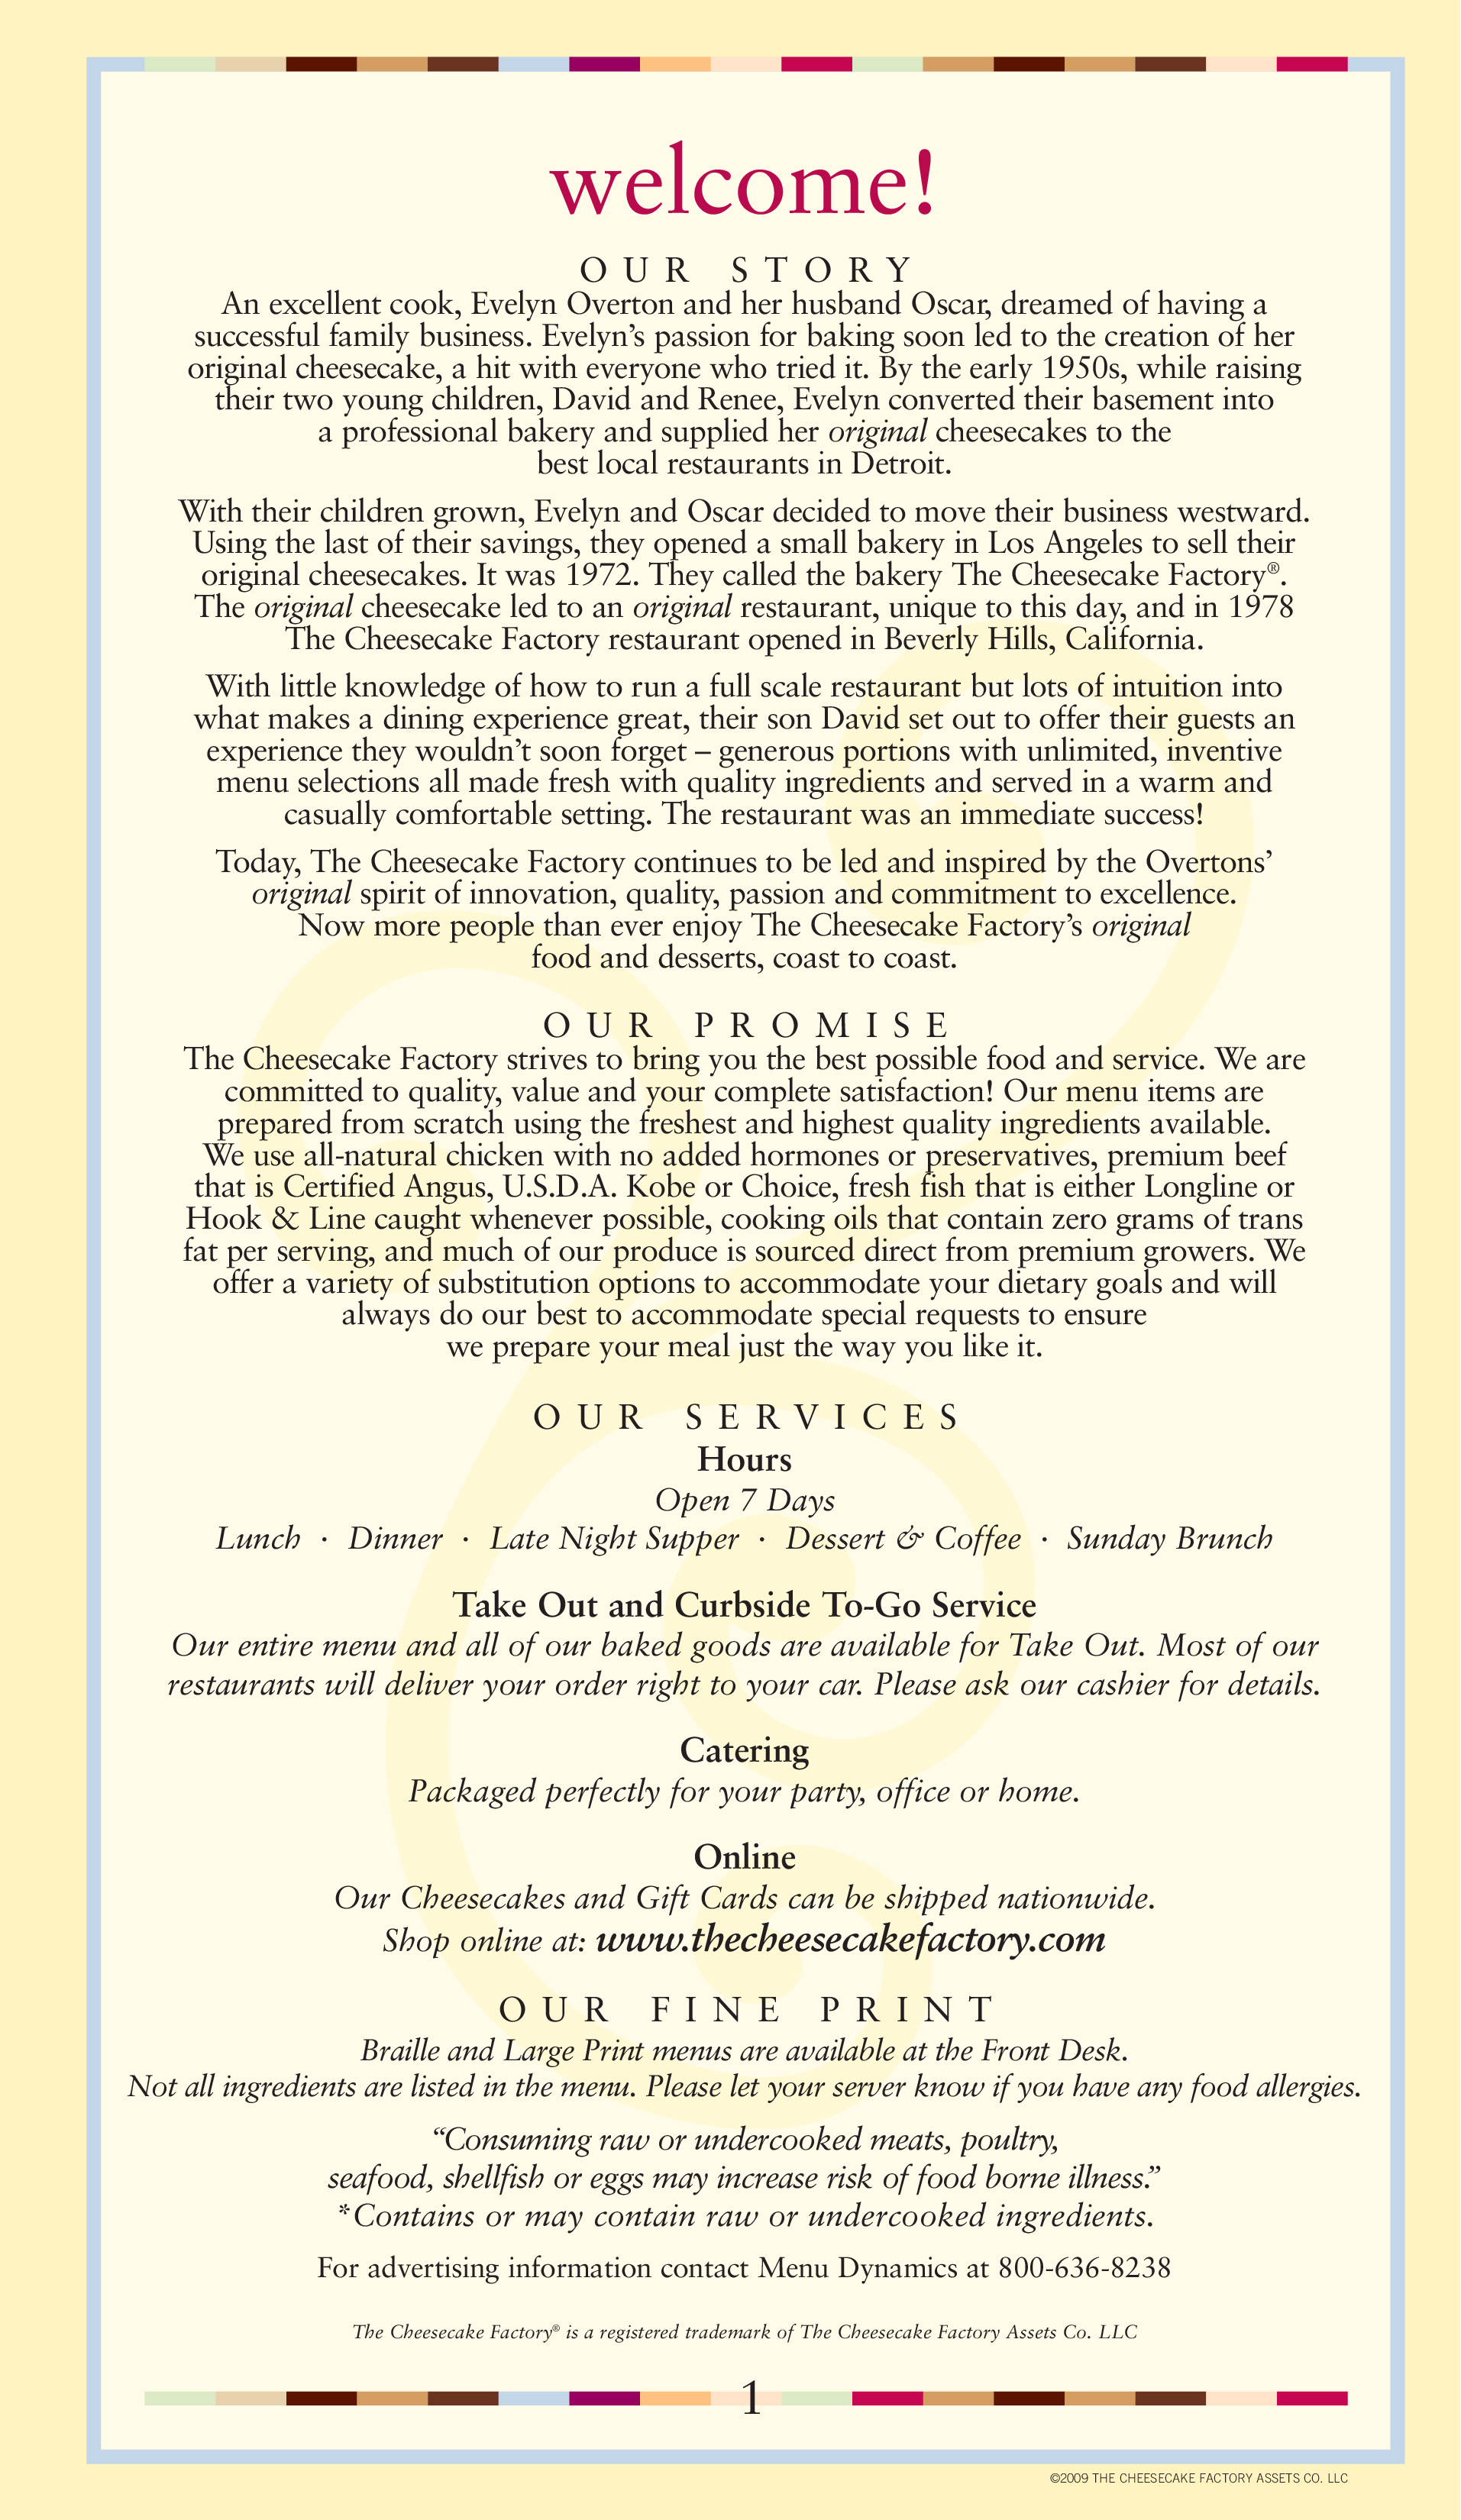 Mesmerizing image for printable cheesecake factory menu